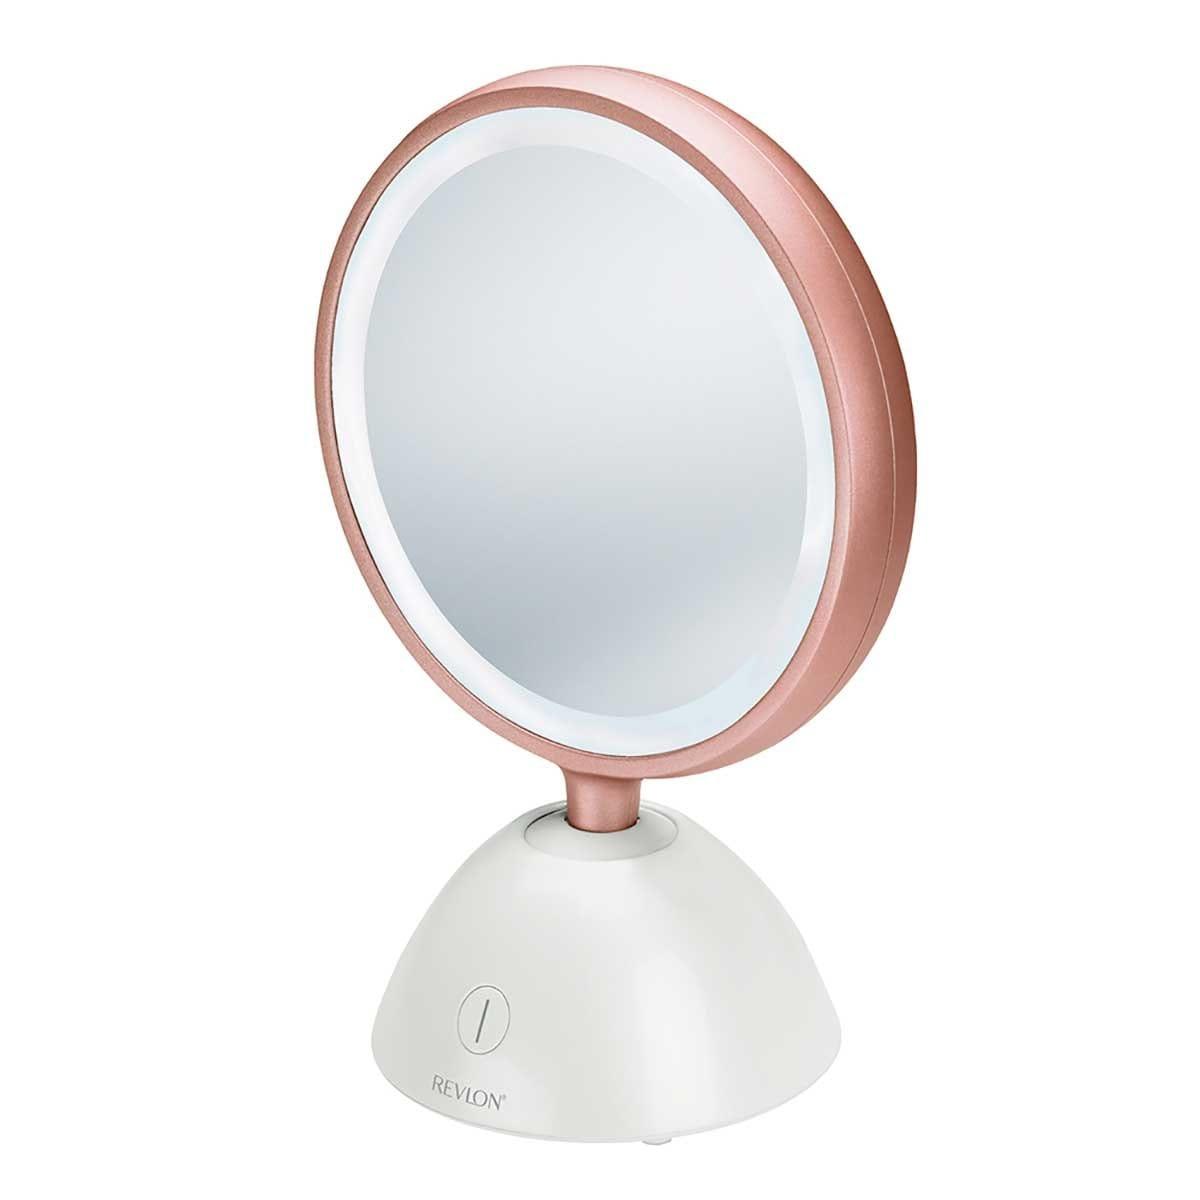 Illuminating Espejo de Belleza Led Revlon